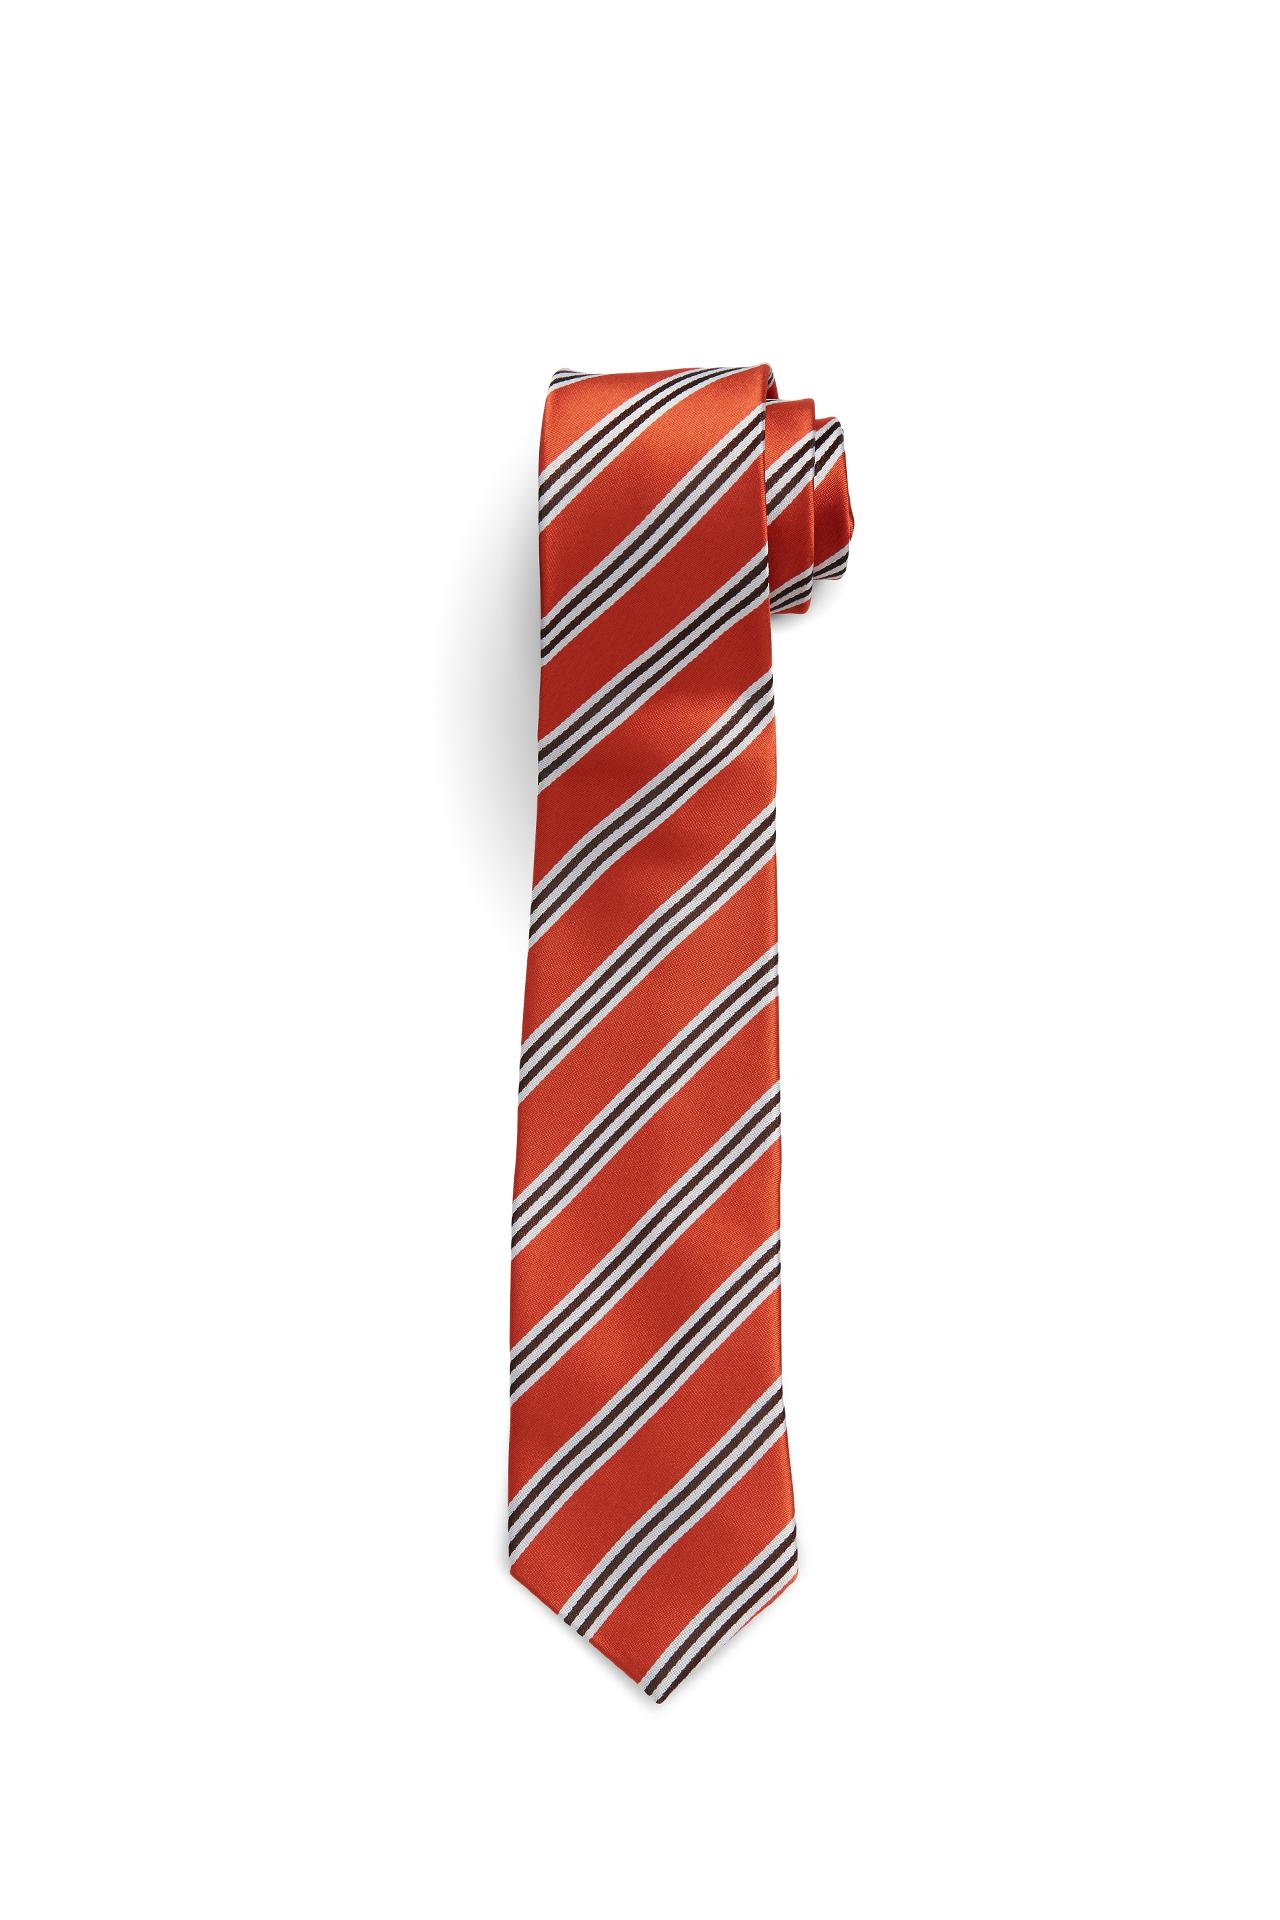 Burnt Orange and White Stripe Tie